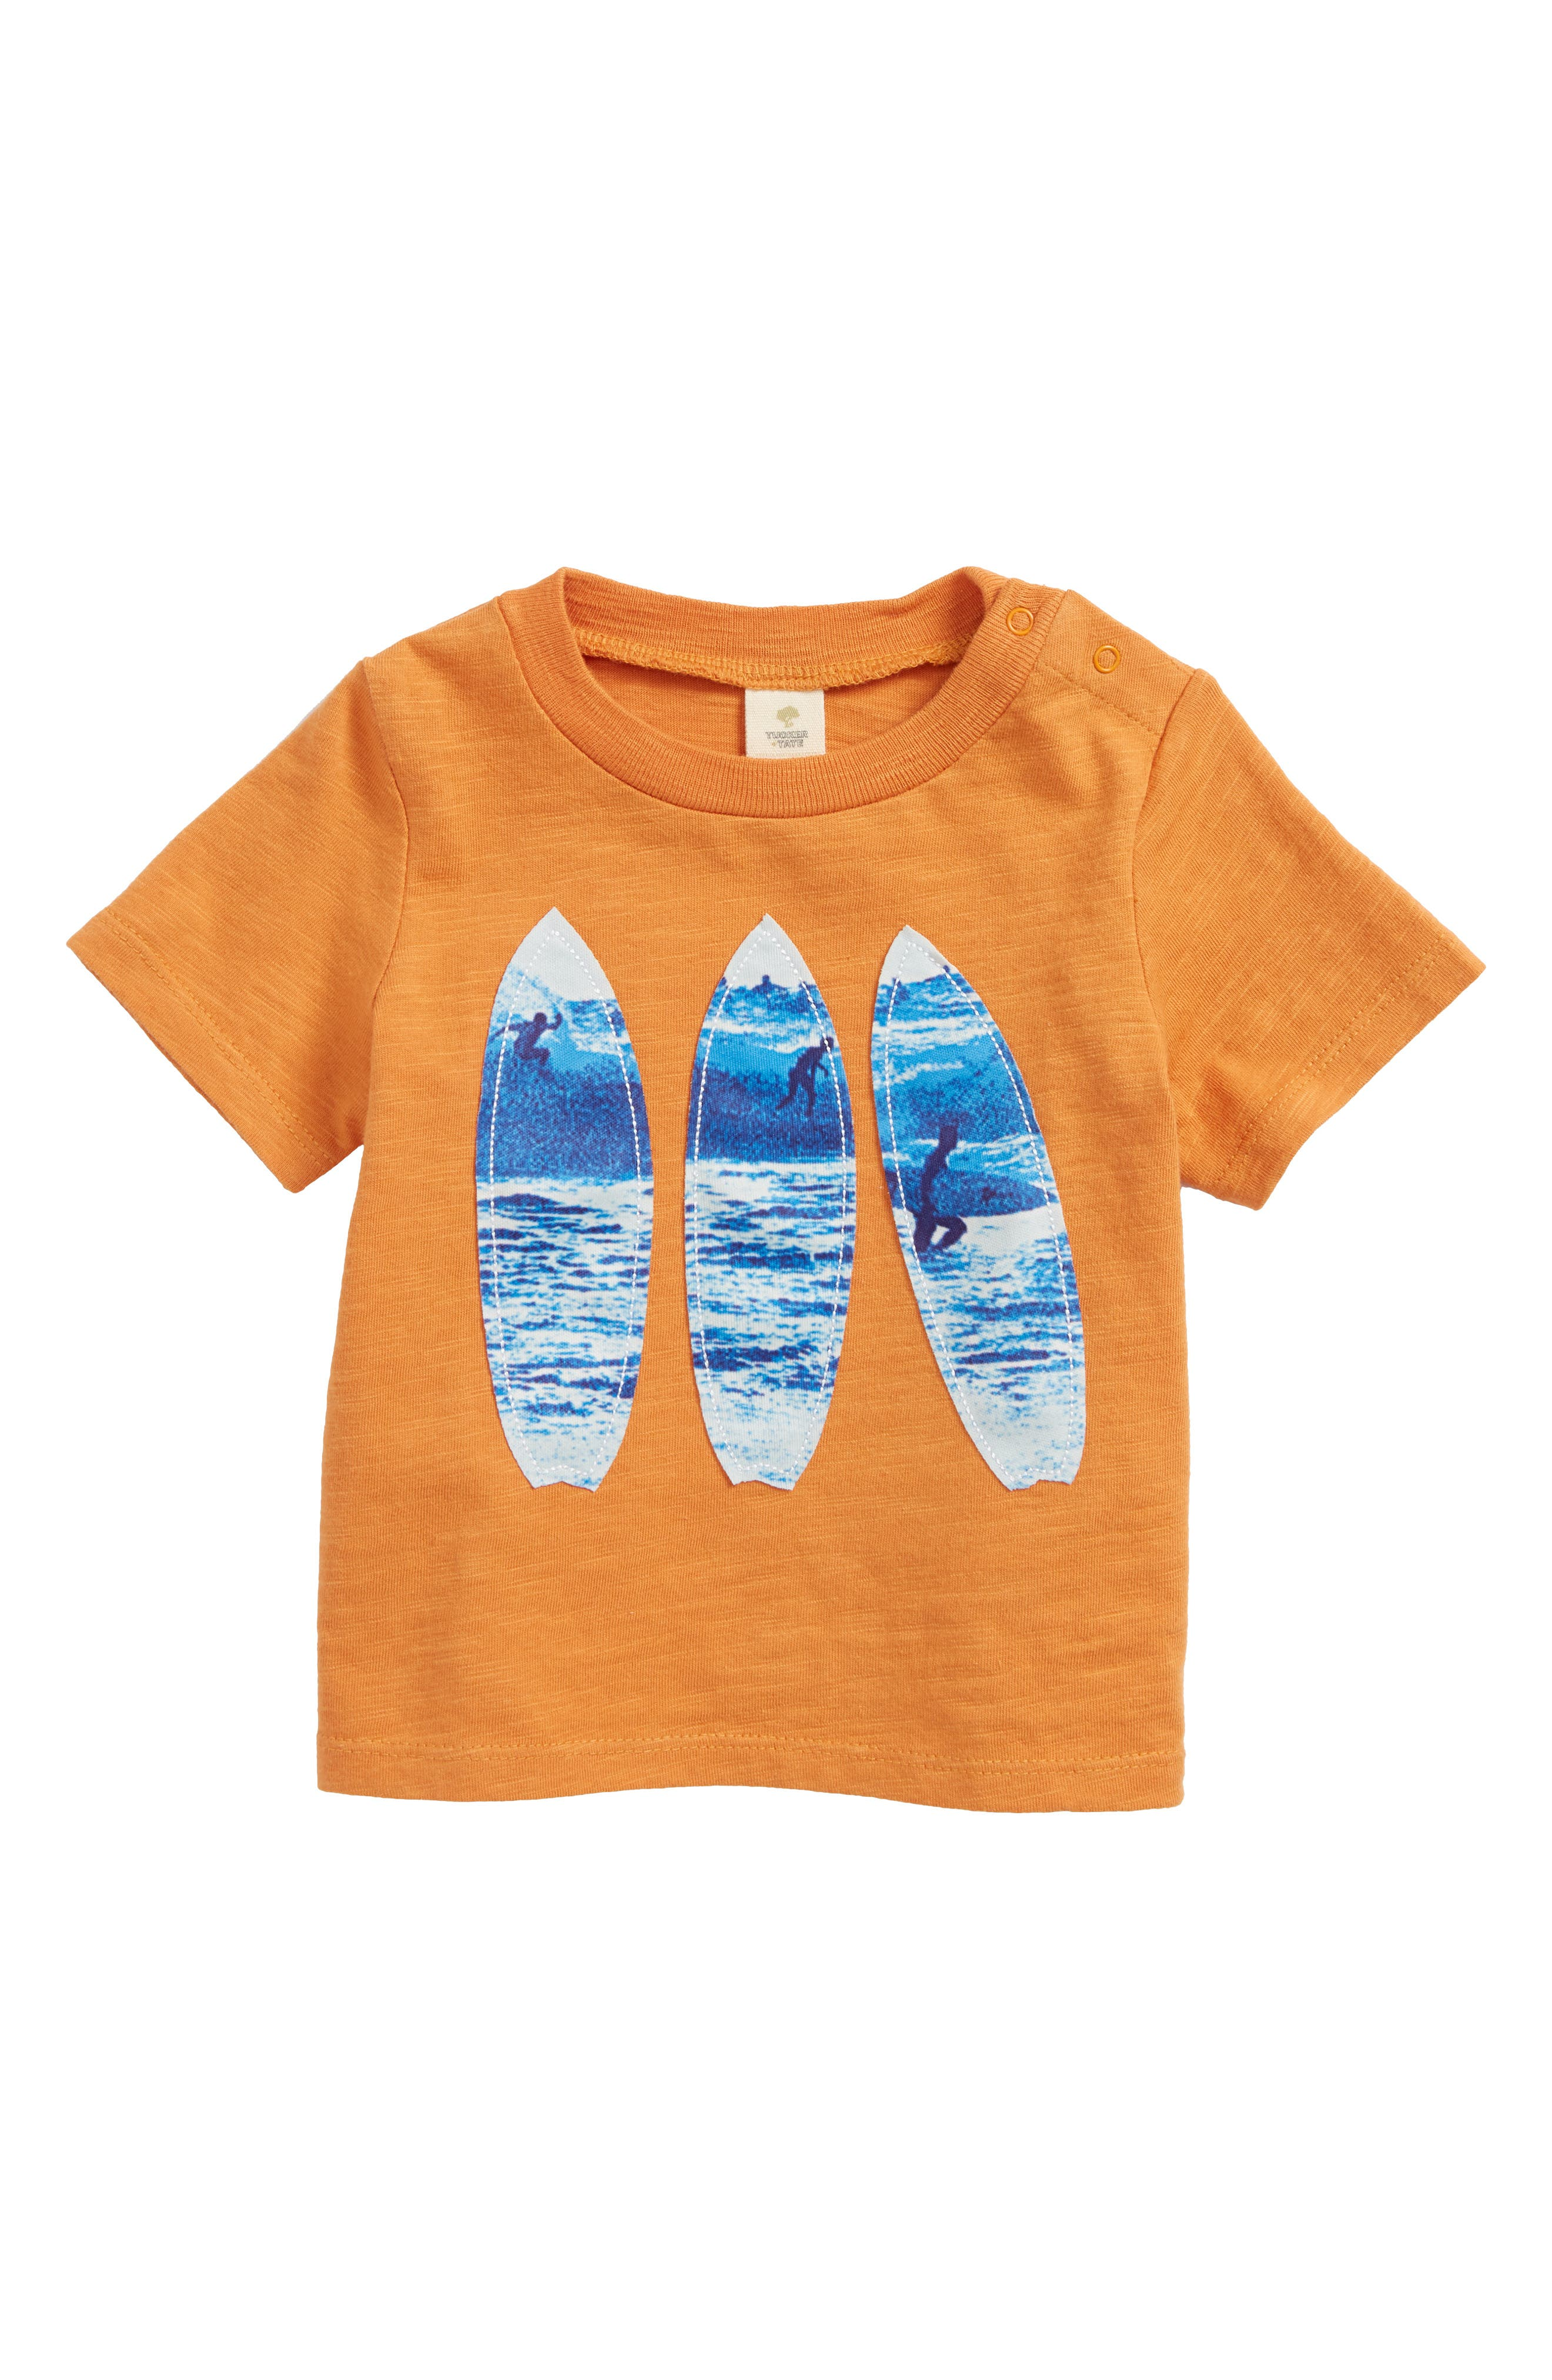 Surfboard Appliqué T-Shirt,                         Main,                         color, Orange Glaze Surfboards